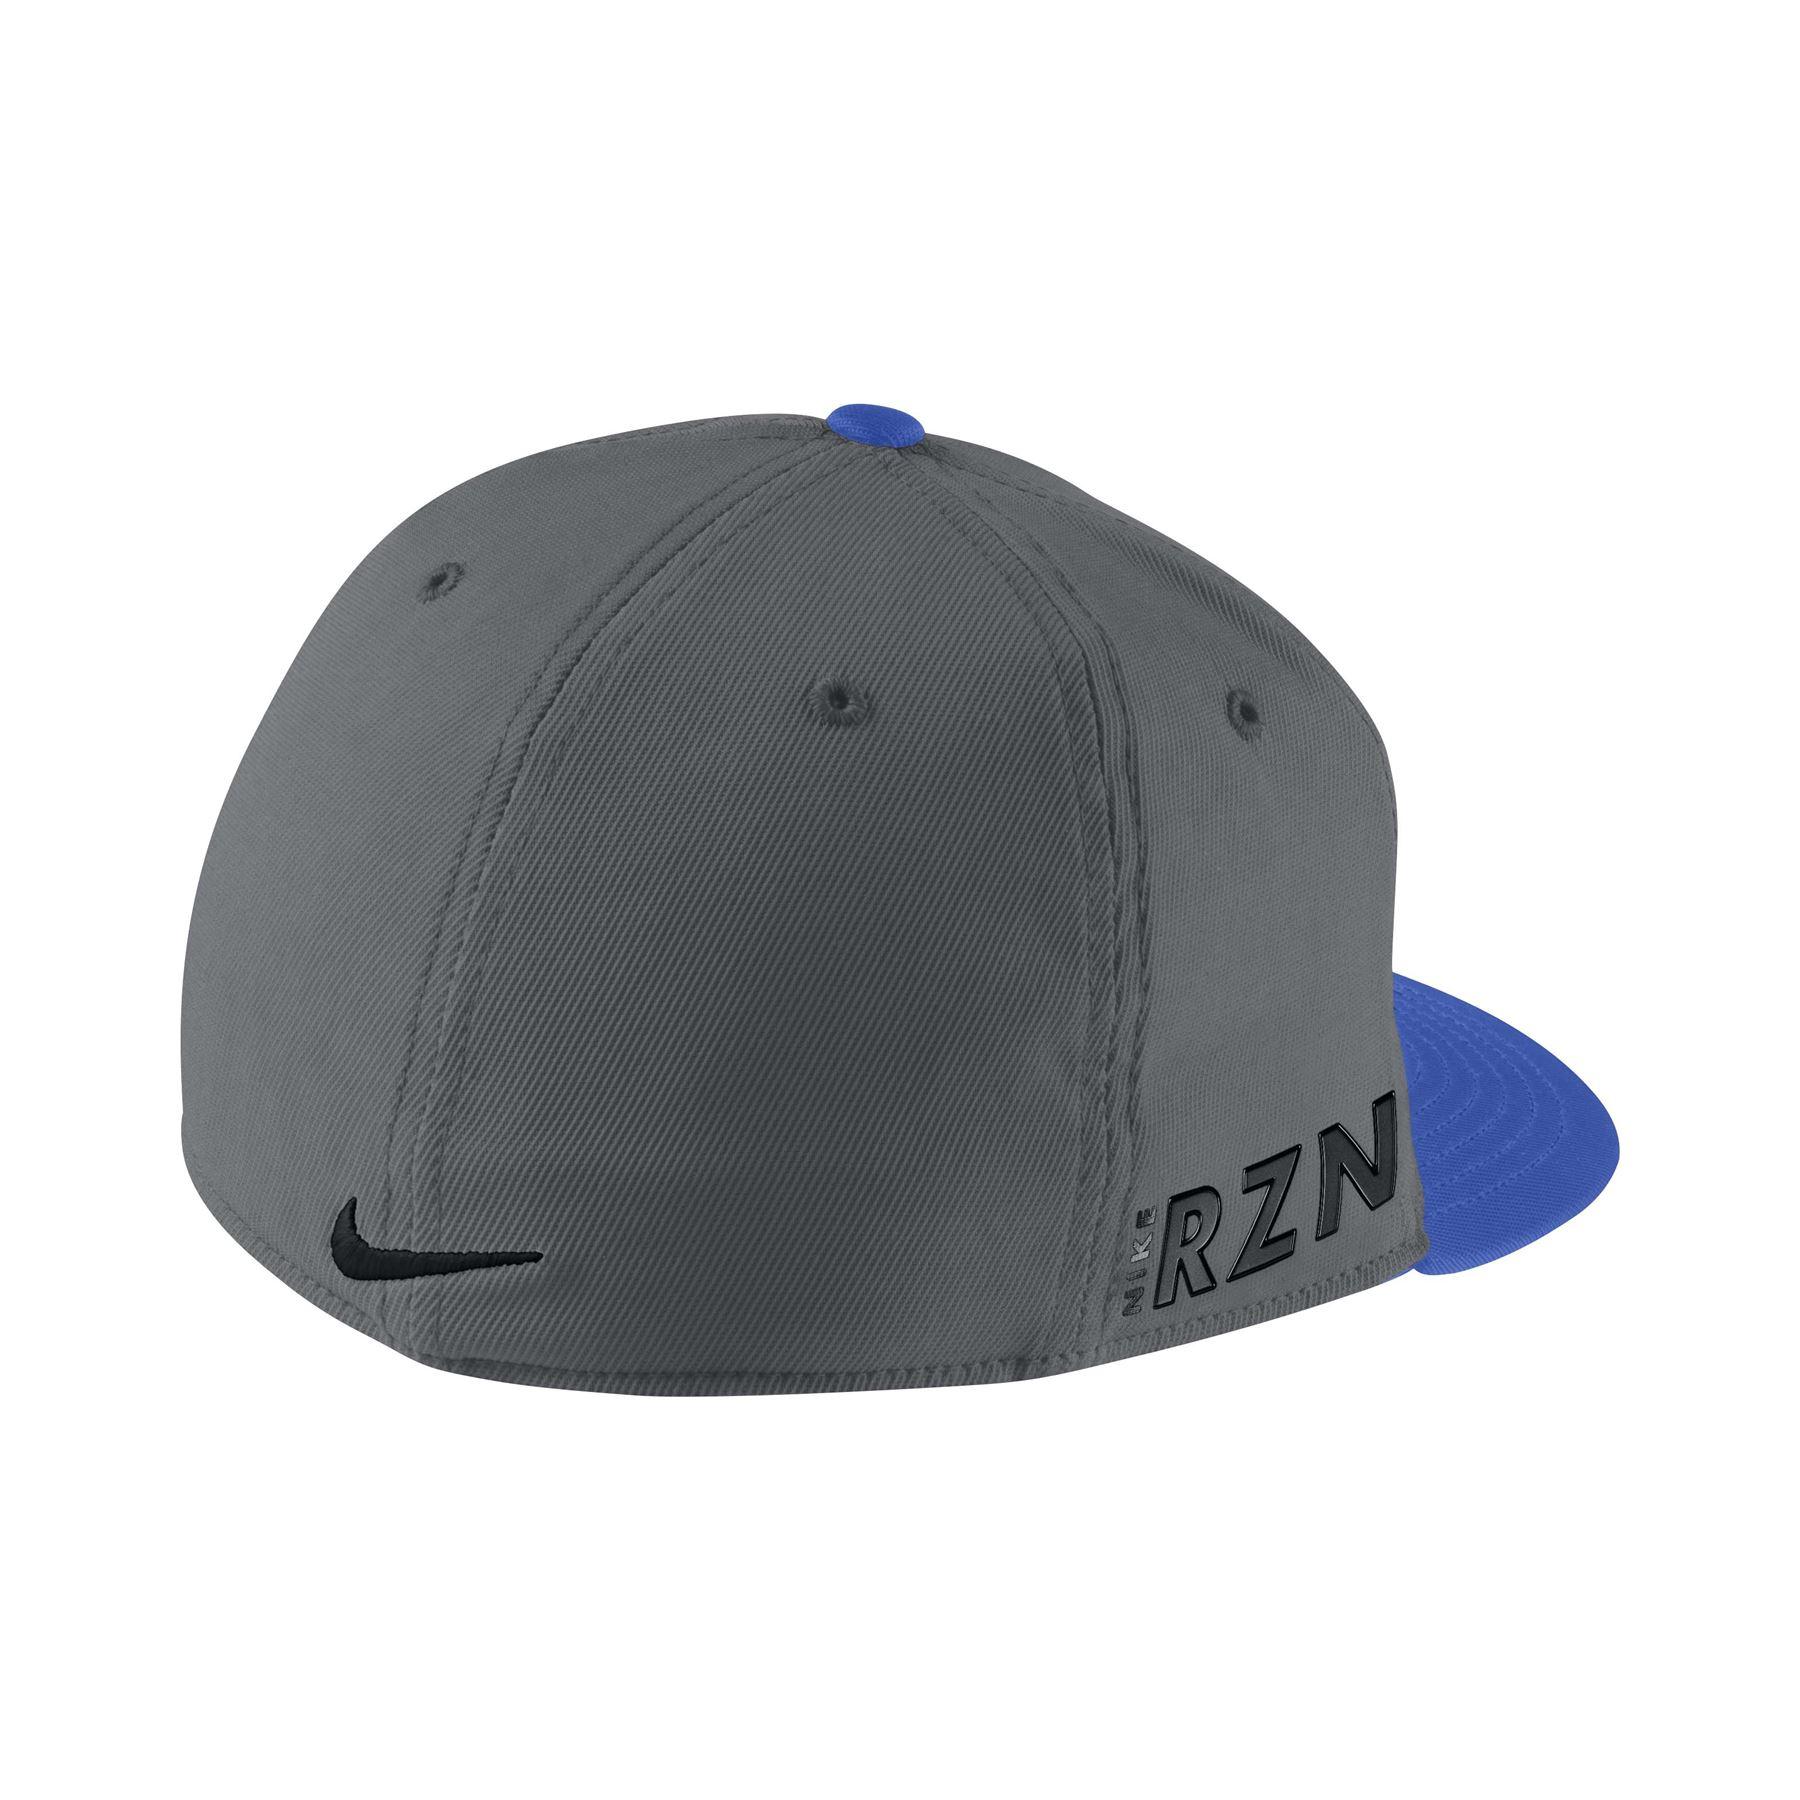 2014 Nike Golf Flat Bill Tour Fitted Golf Cap New Logo